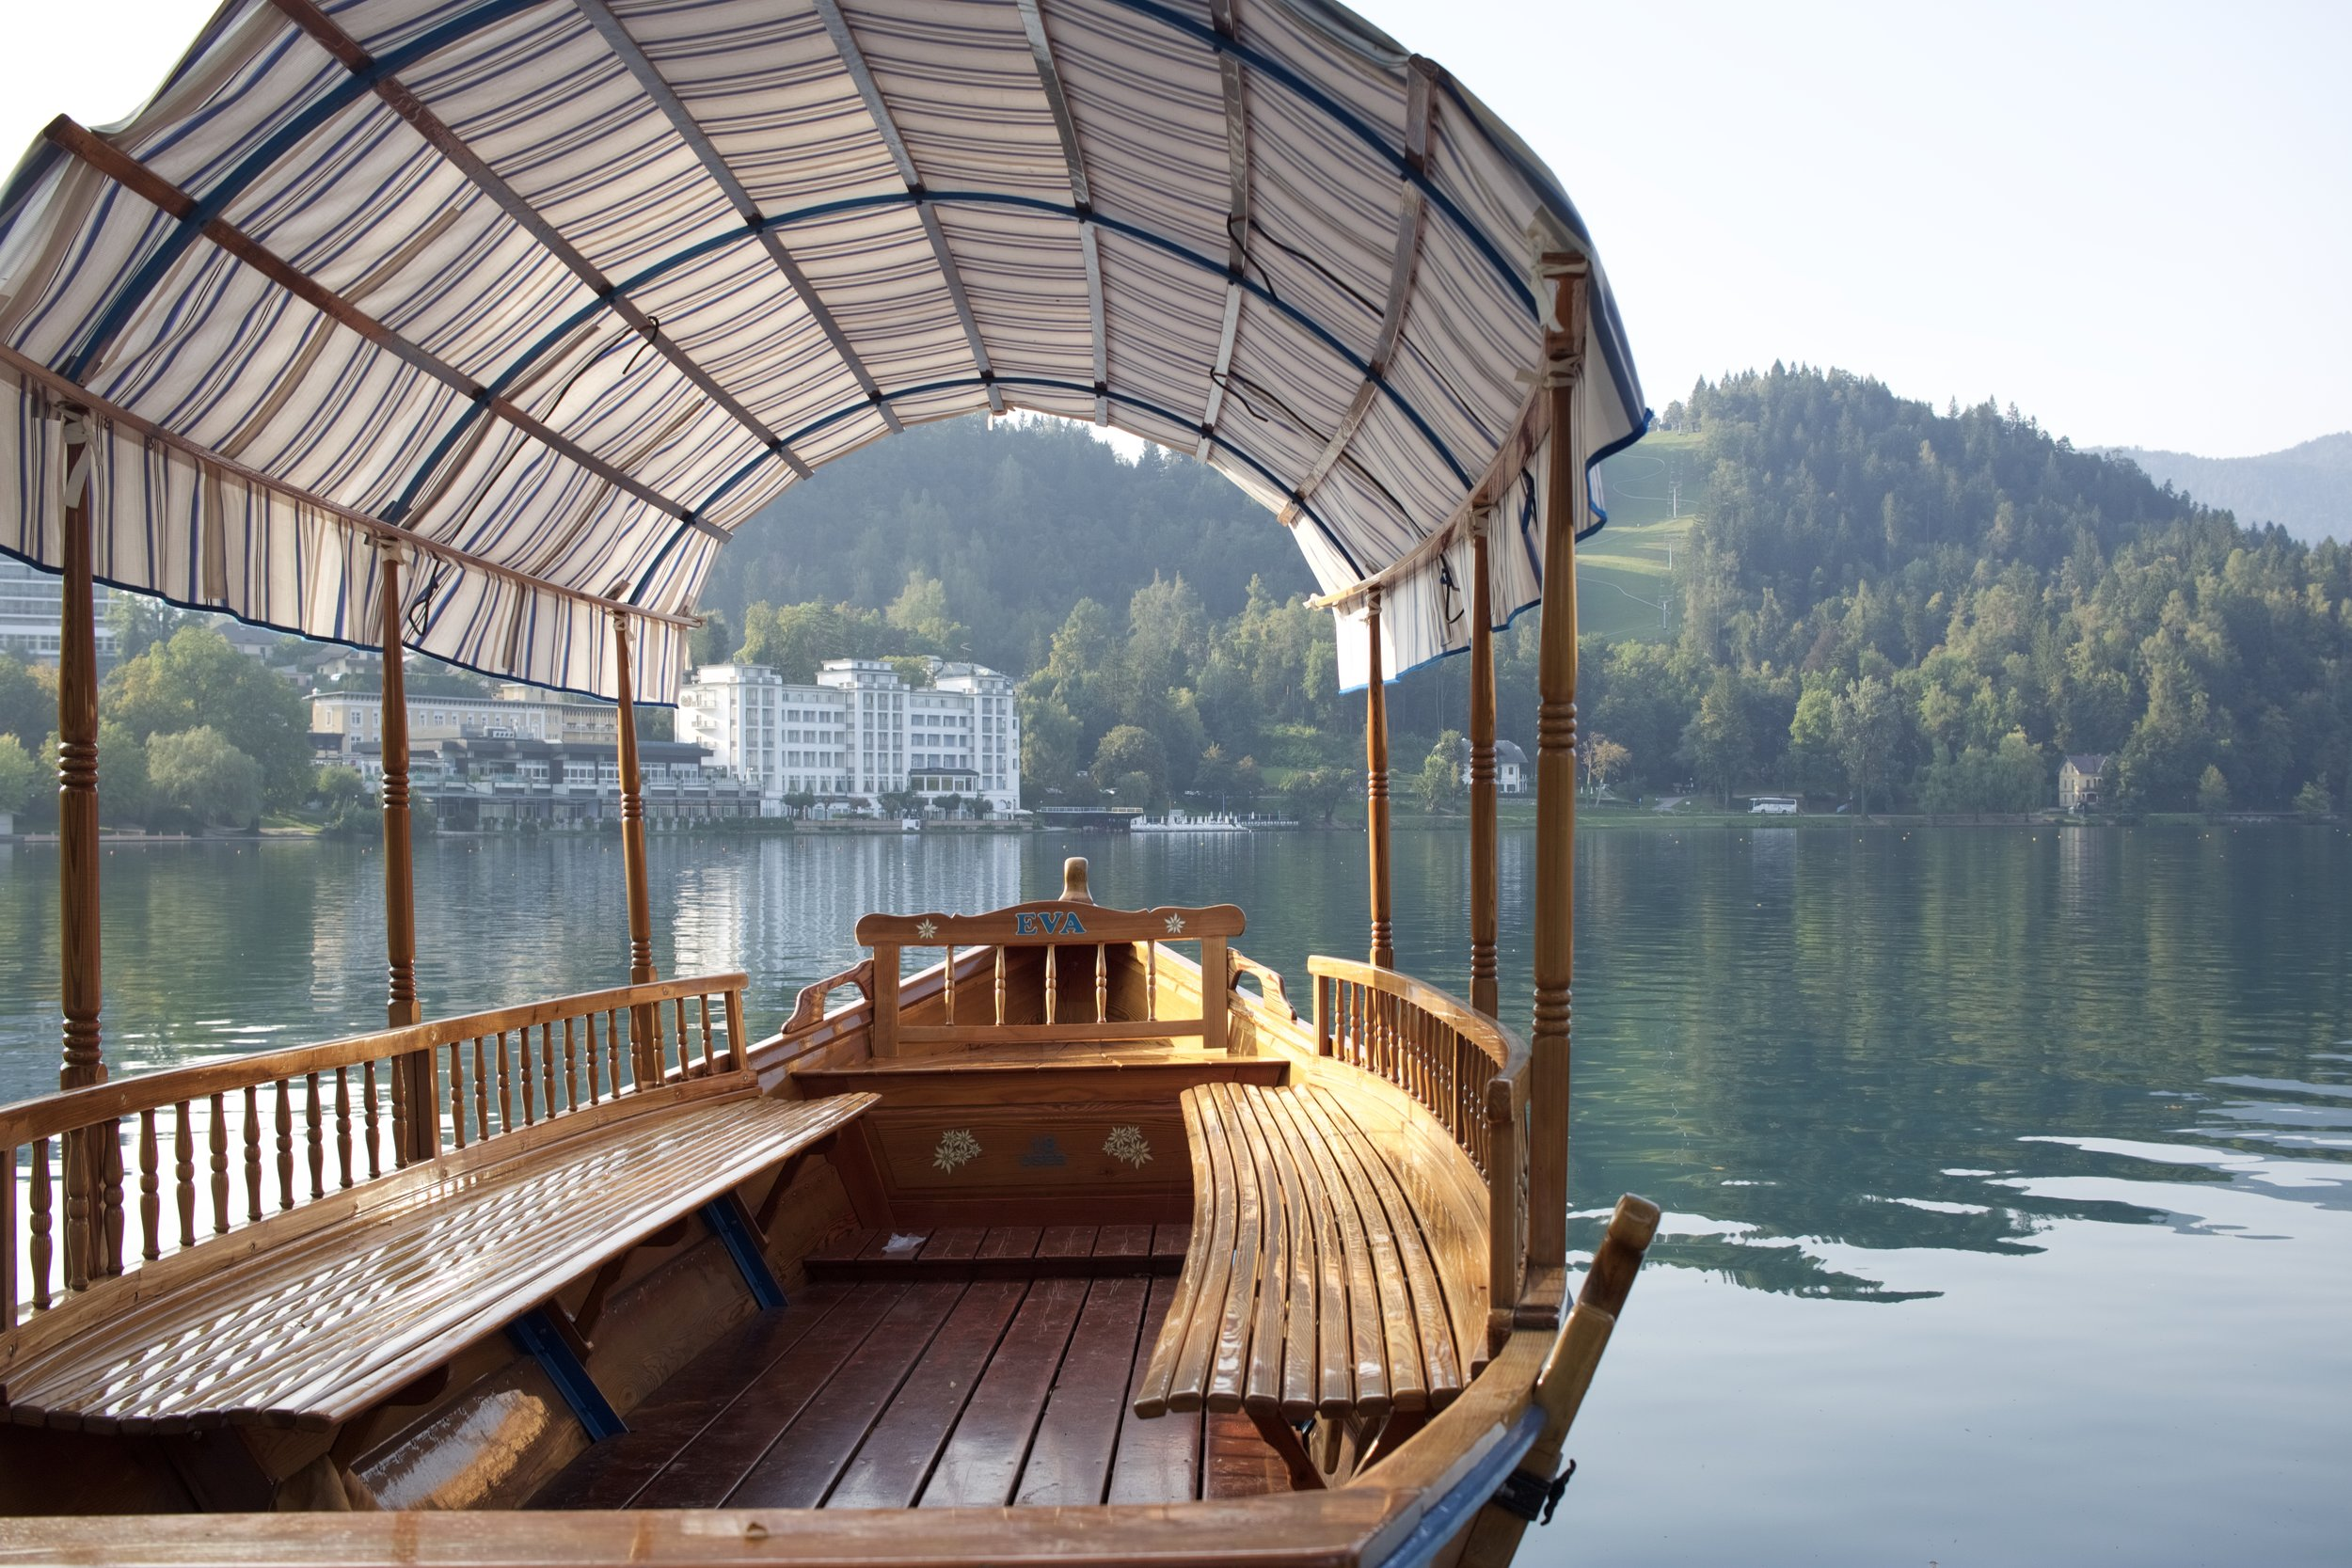 A traditional Pletna boat, Lake Bled, Slovenia